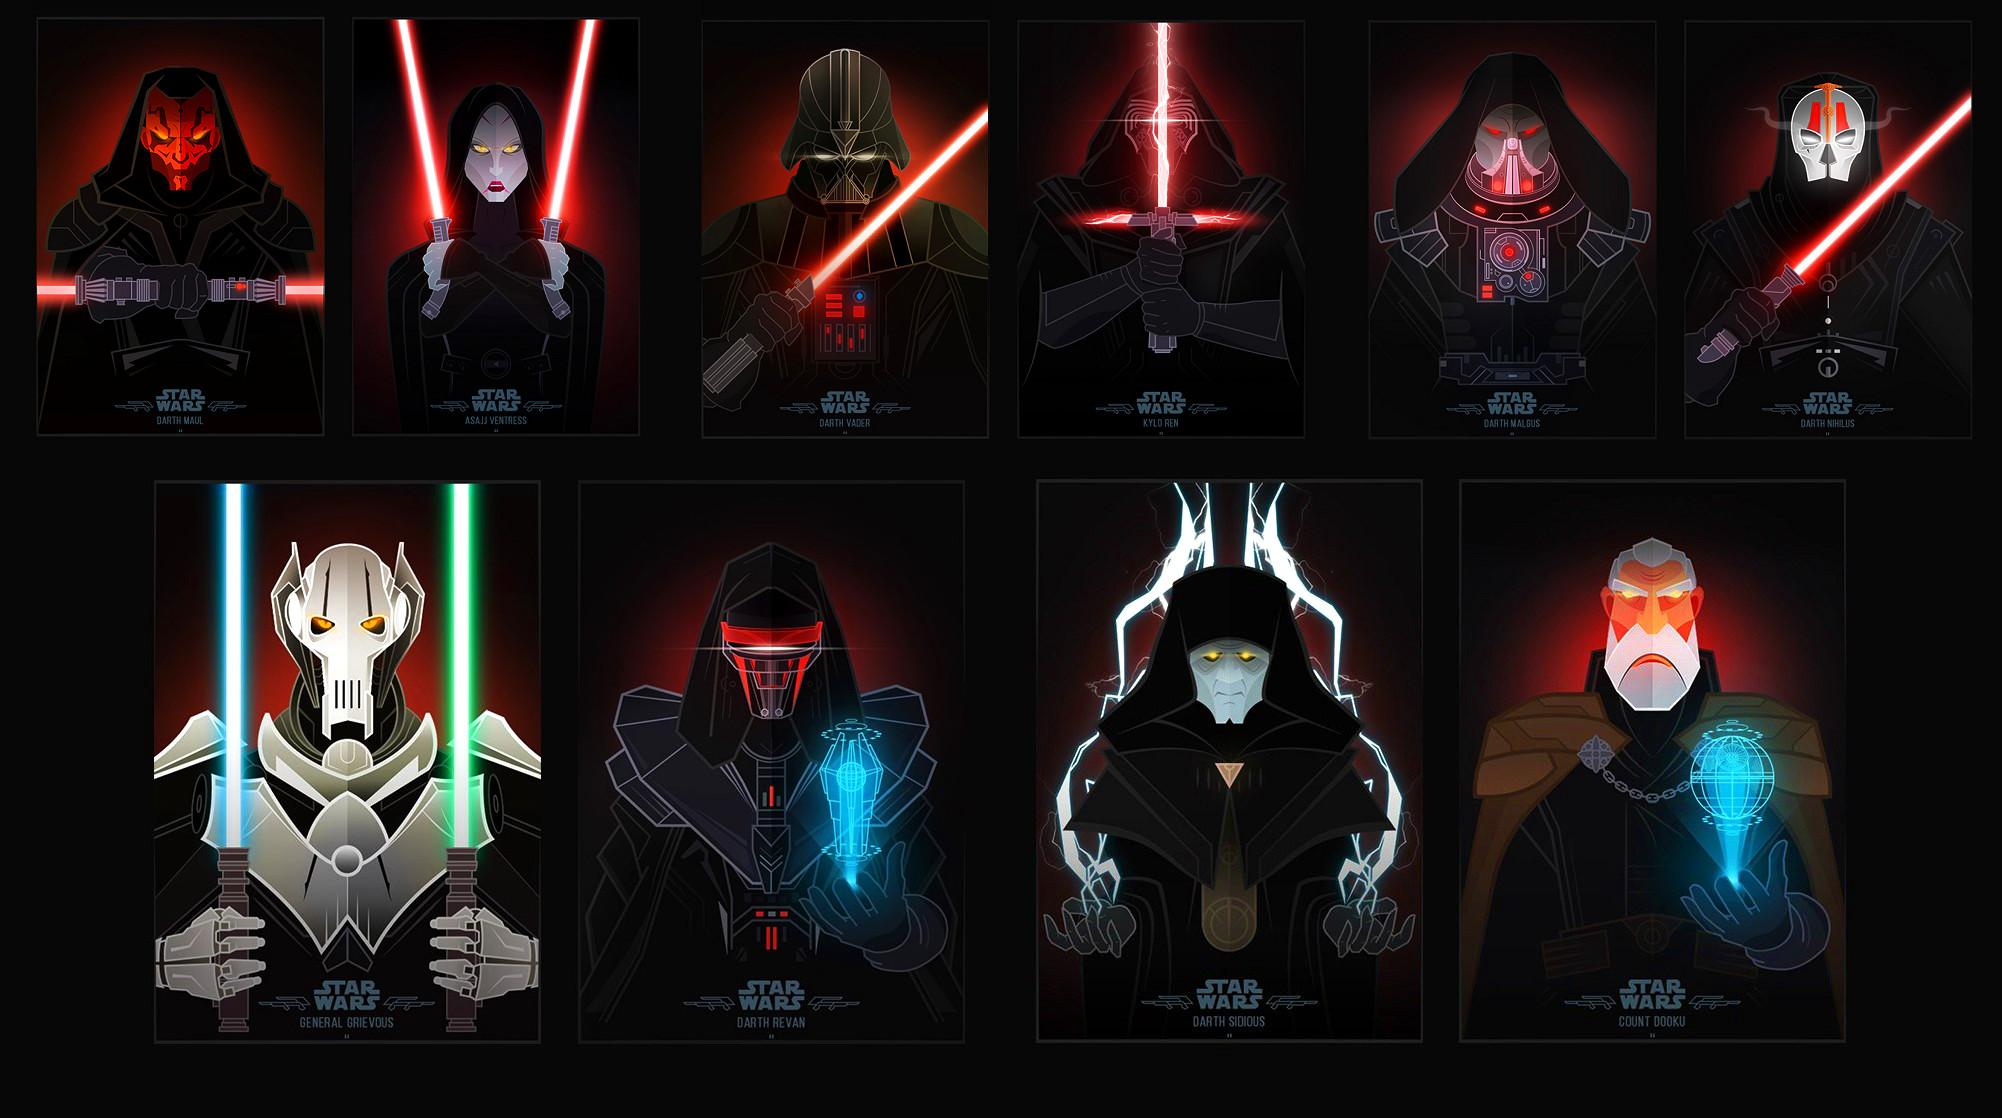 Star Wars Sith wallpaper hd resolution